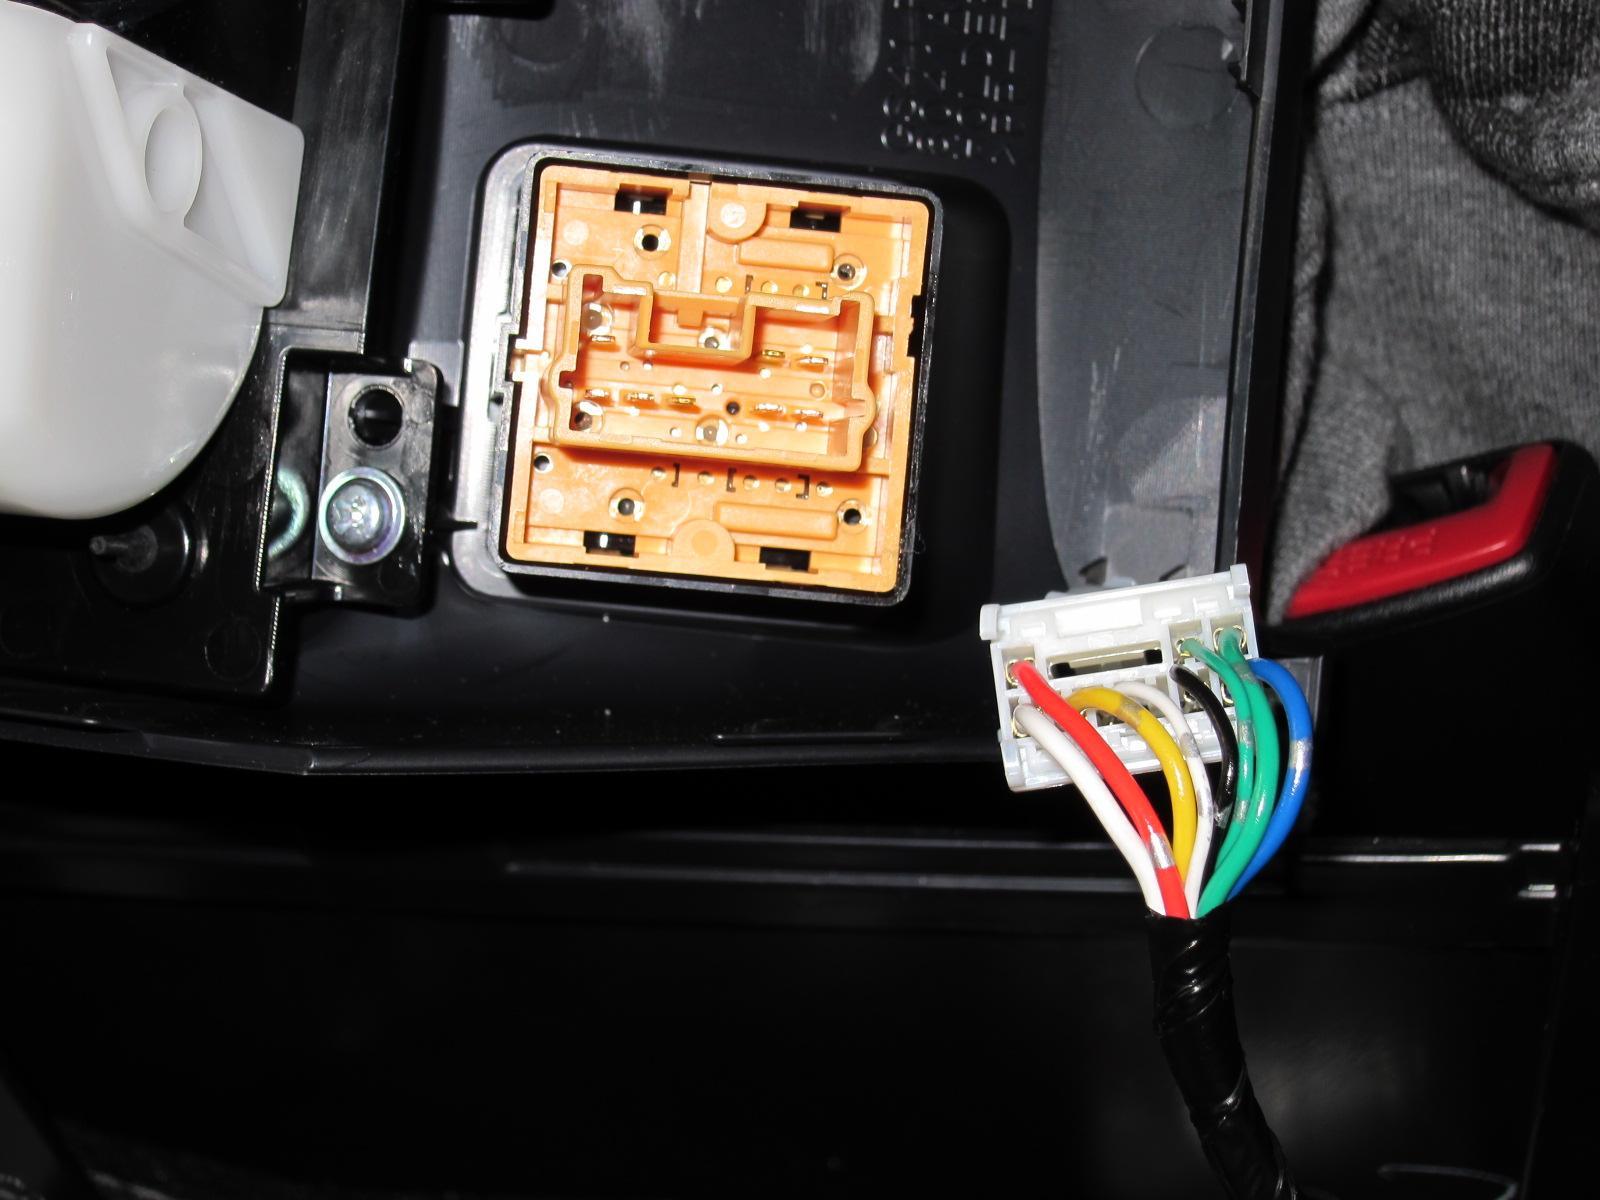 Ford Explorer Power Seat Wiring Diagram On Isuzu Glow Plug Diagram